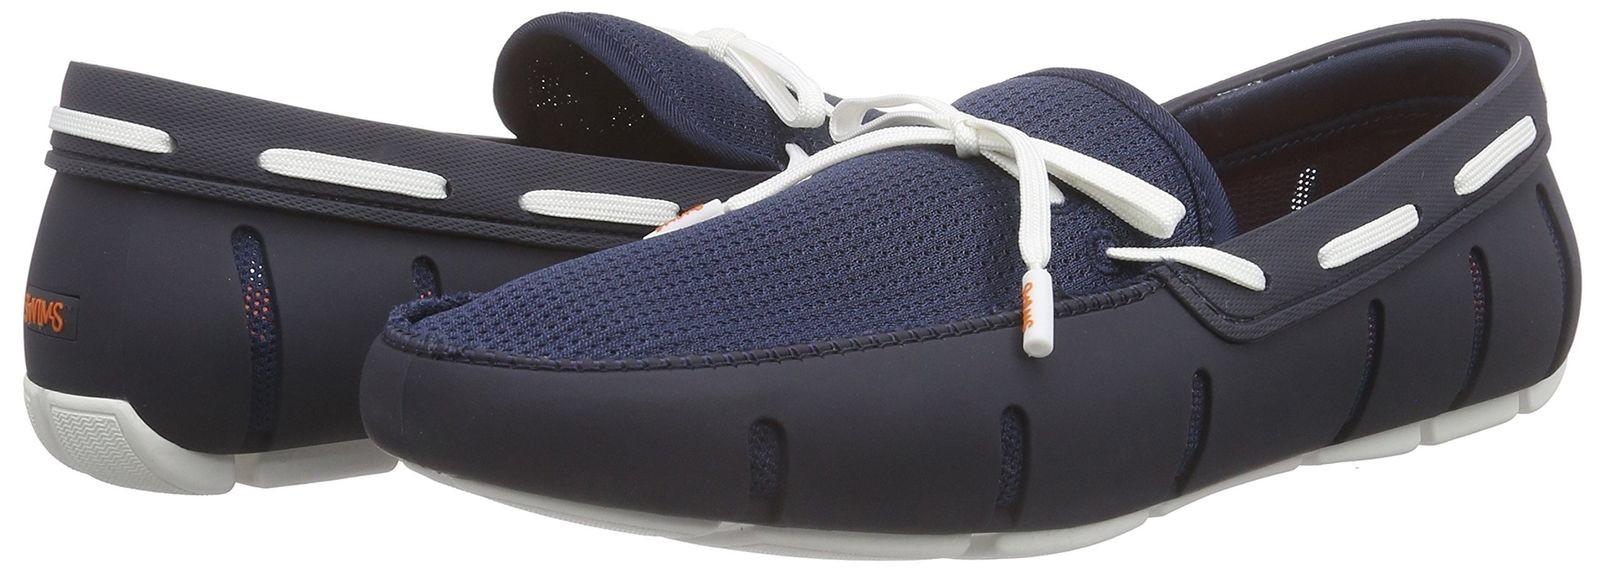 Chaussure bateau bleues et blanc Swims